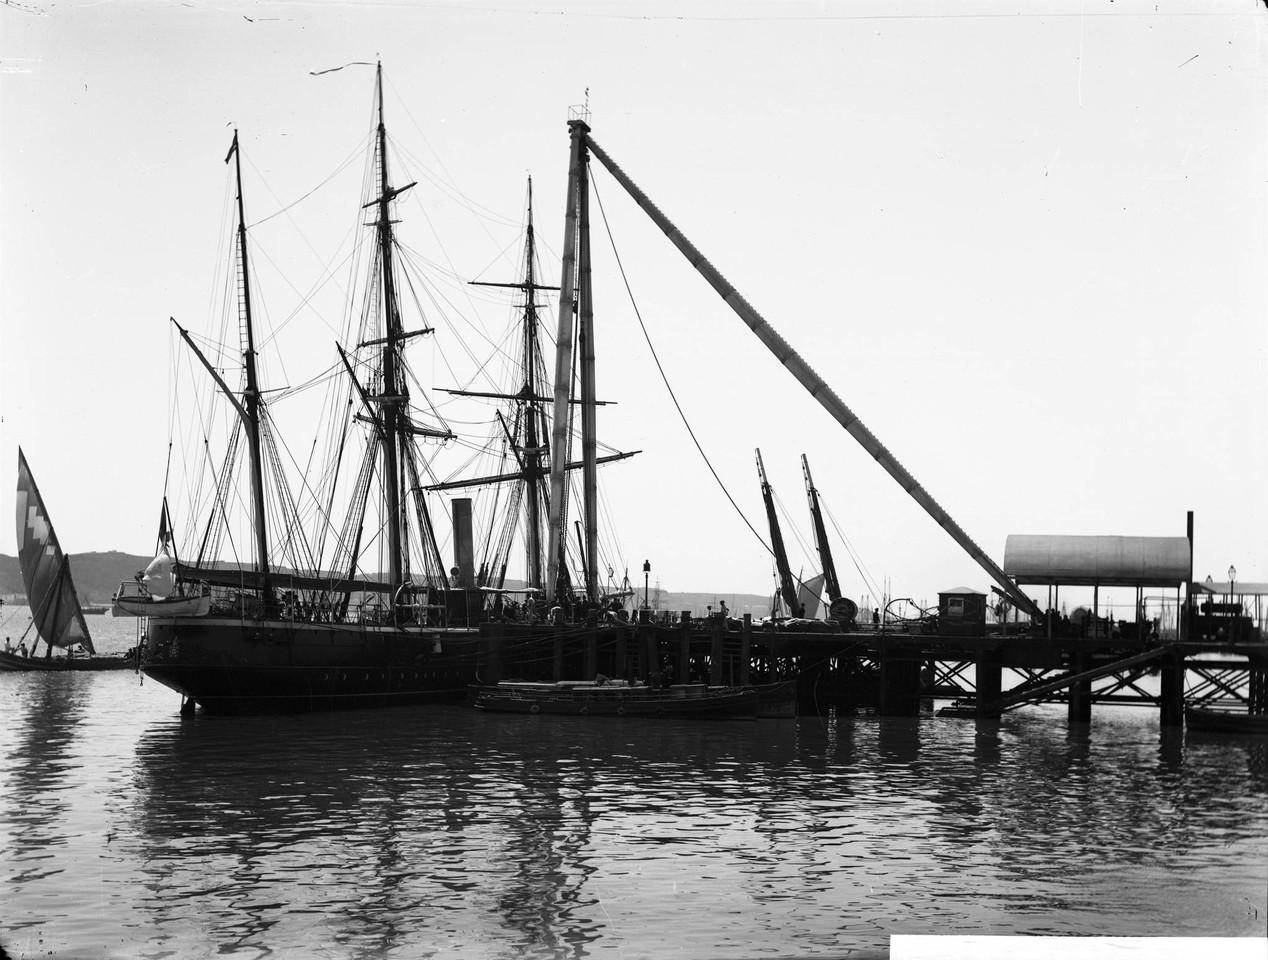 Corveta da armada portuguesa Mindello ancorada jun